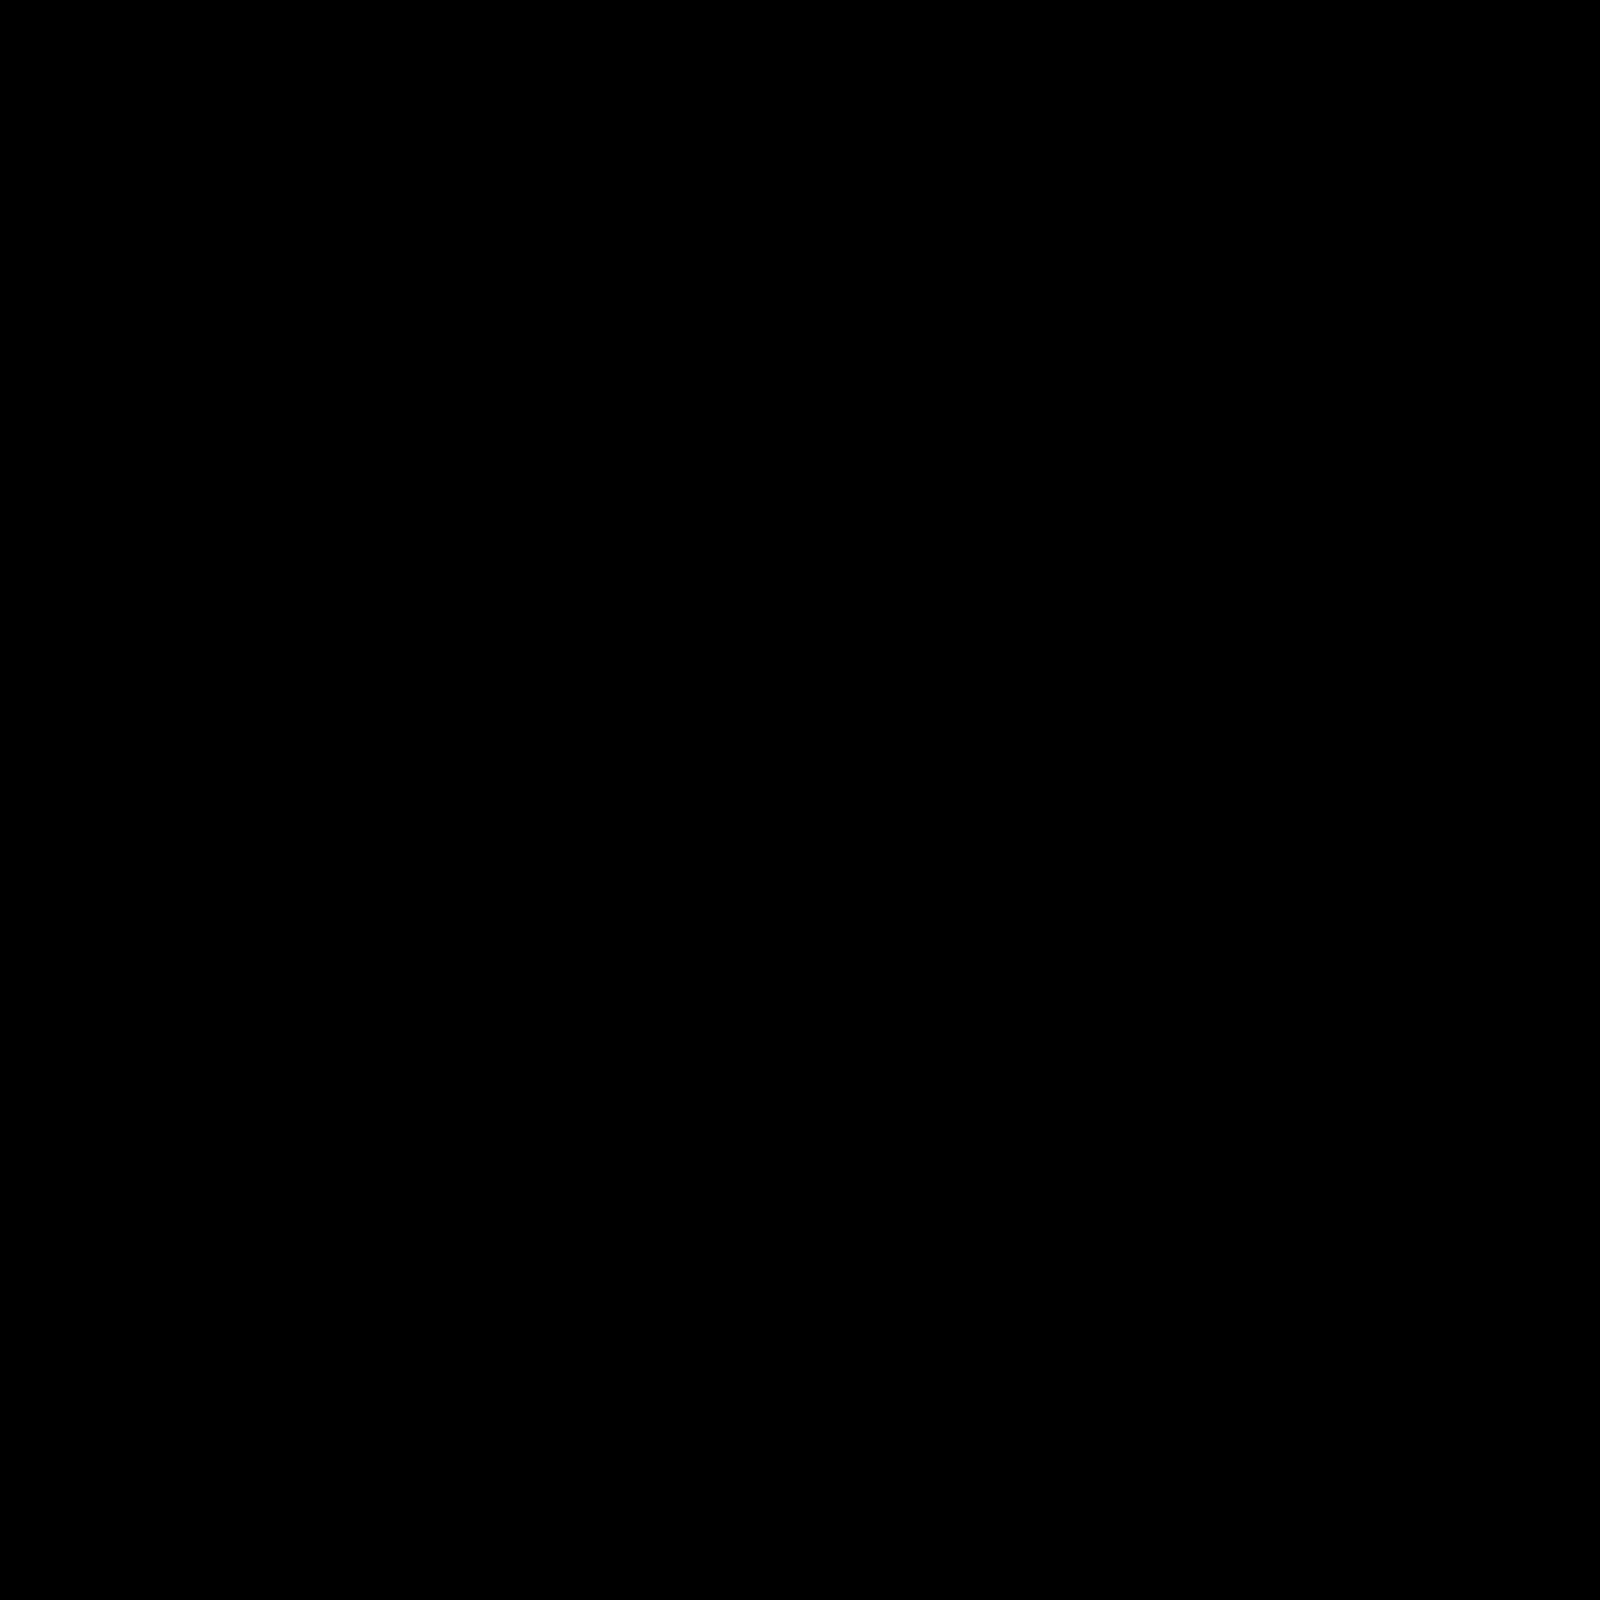 Частота icon